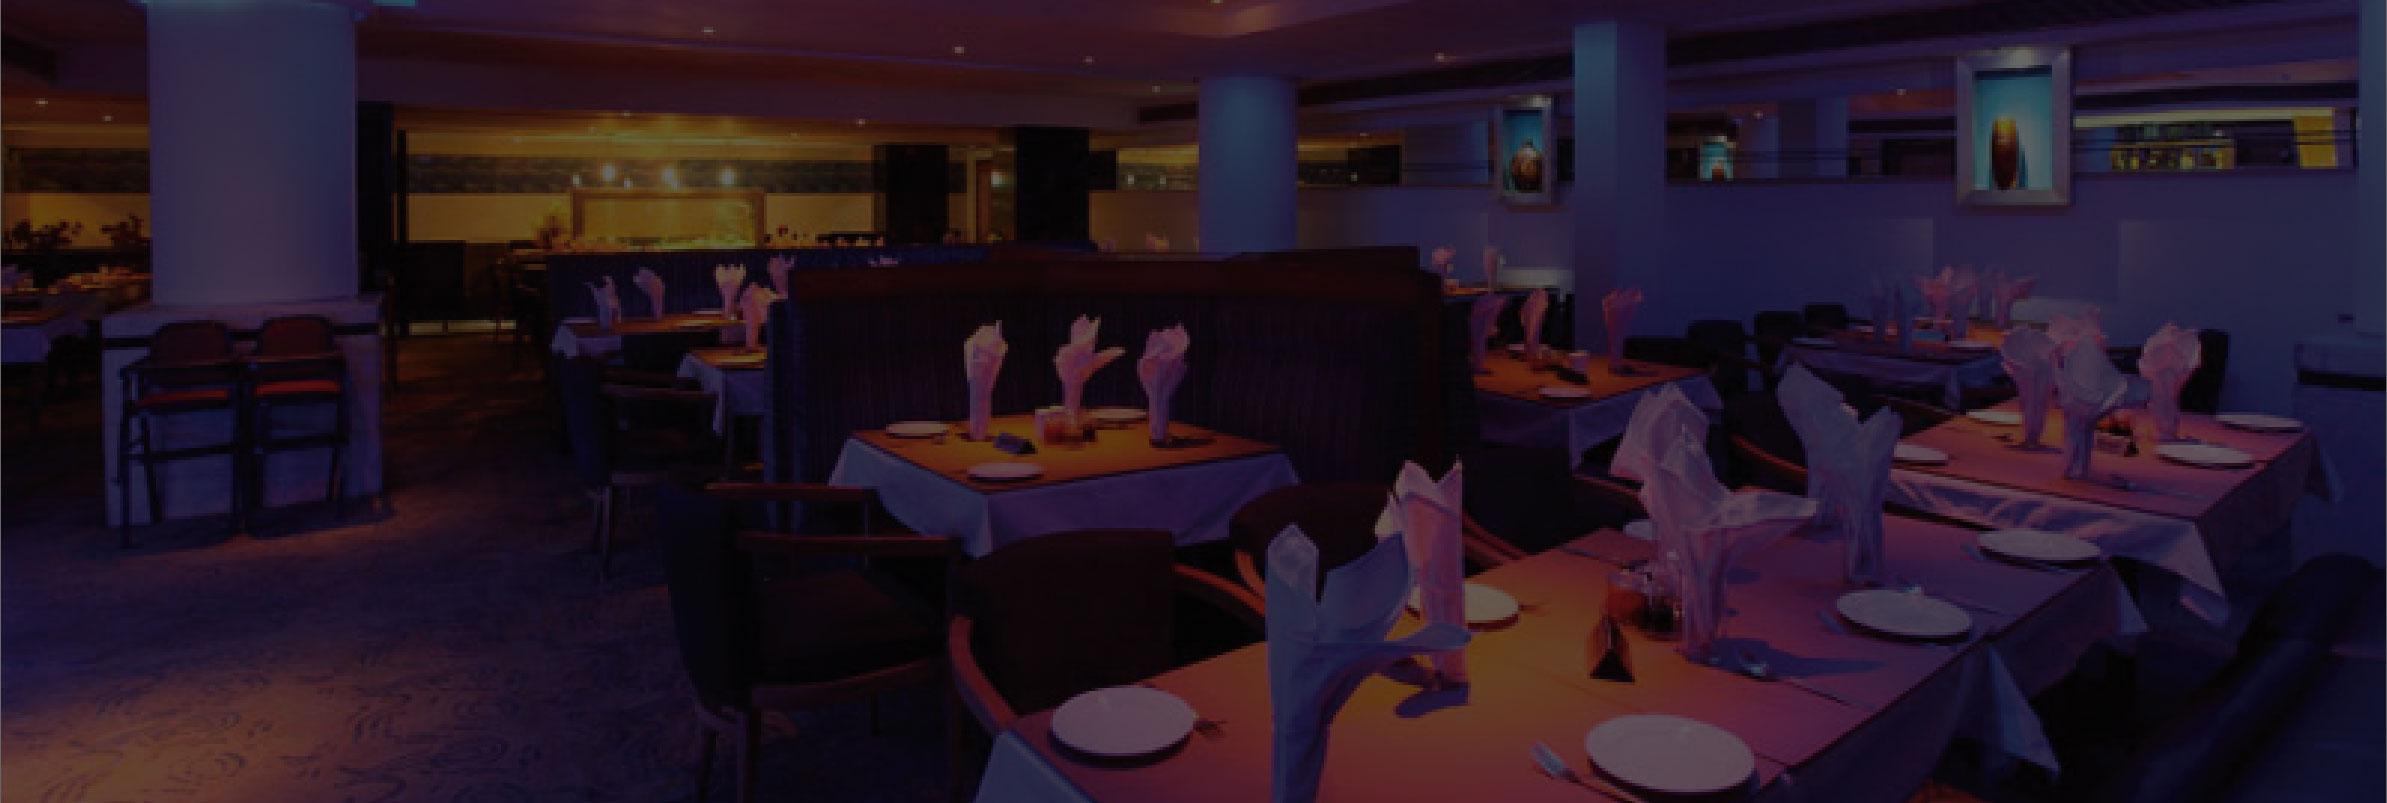 Wavelabs Digital Restaurant App